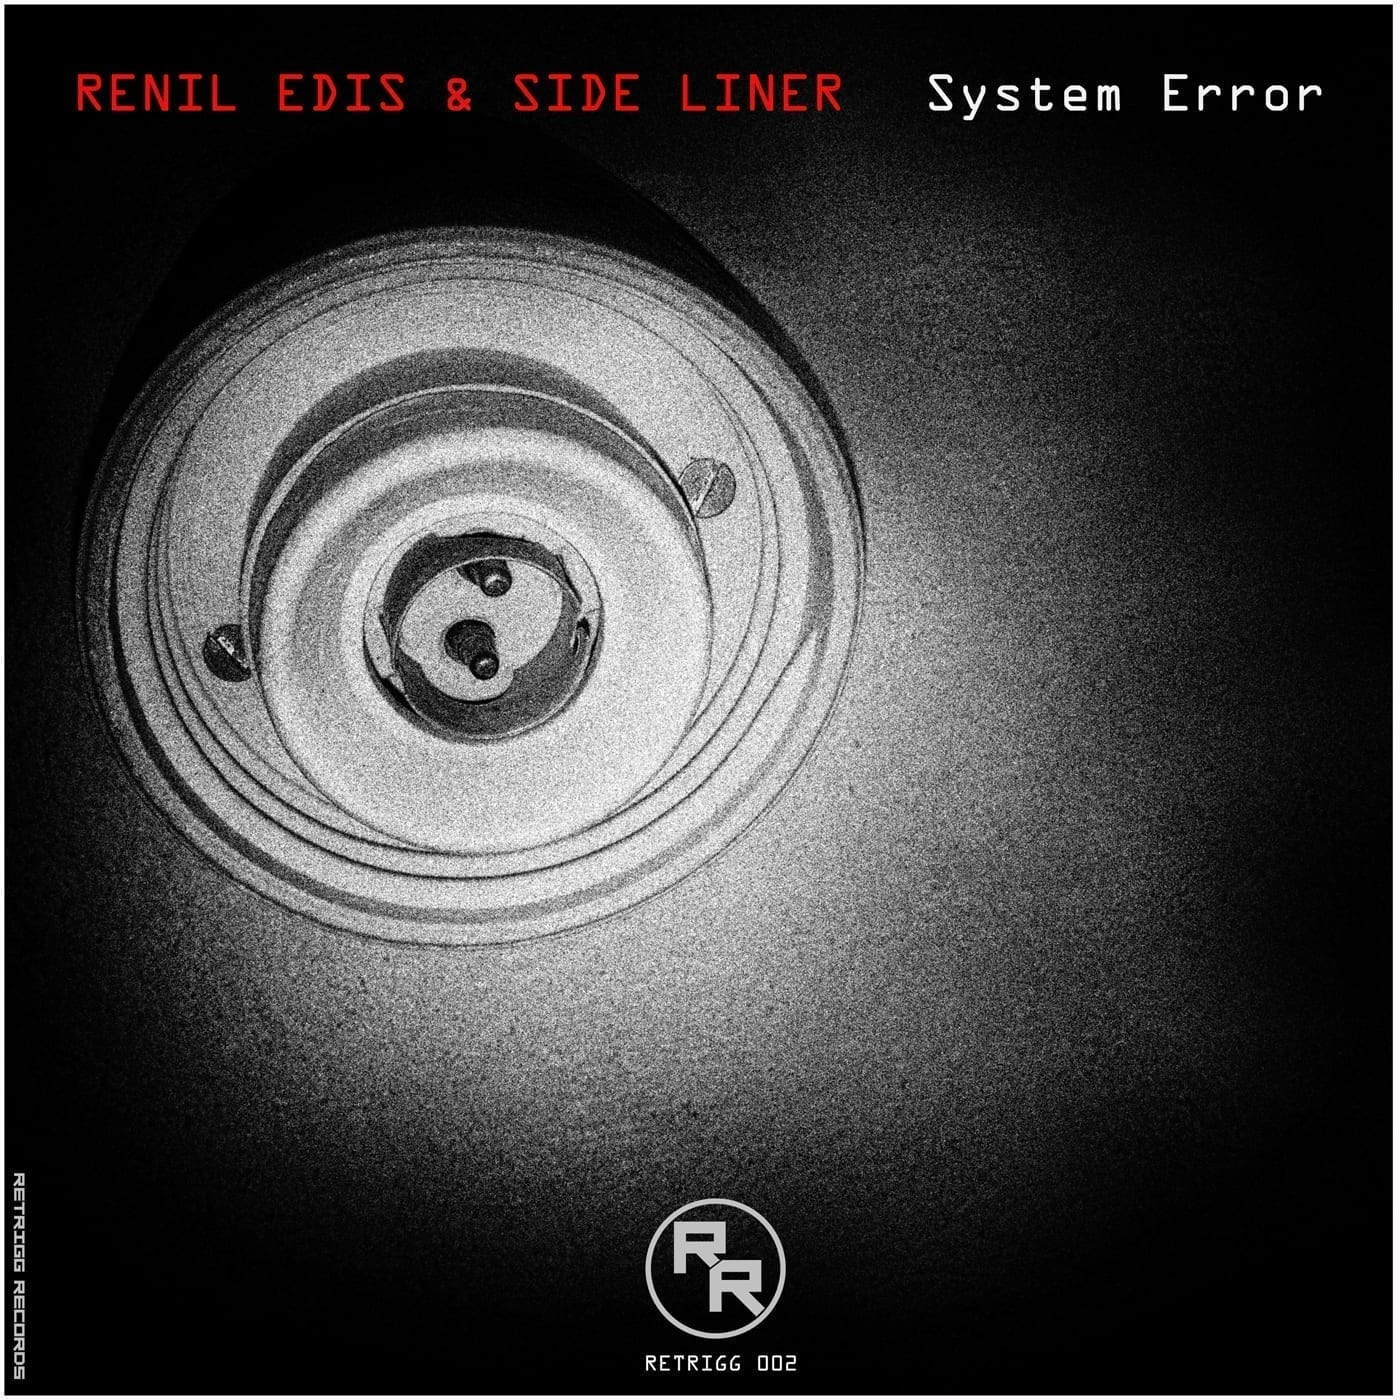 System Error: the new techno ep release of Renil Edis & Side Liner